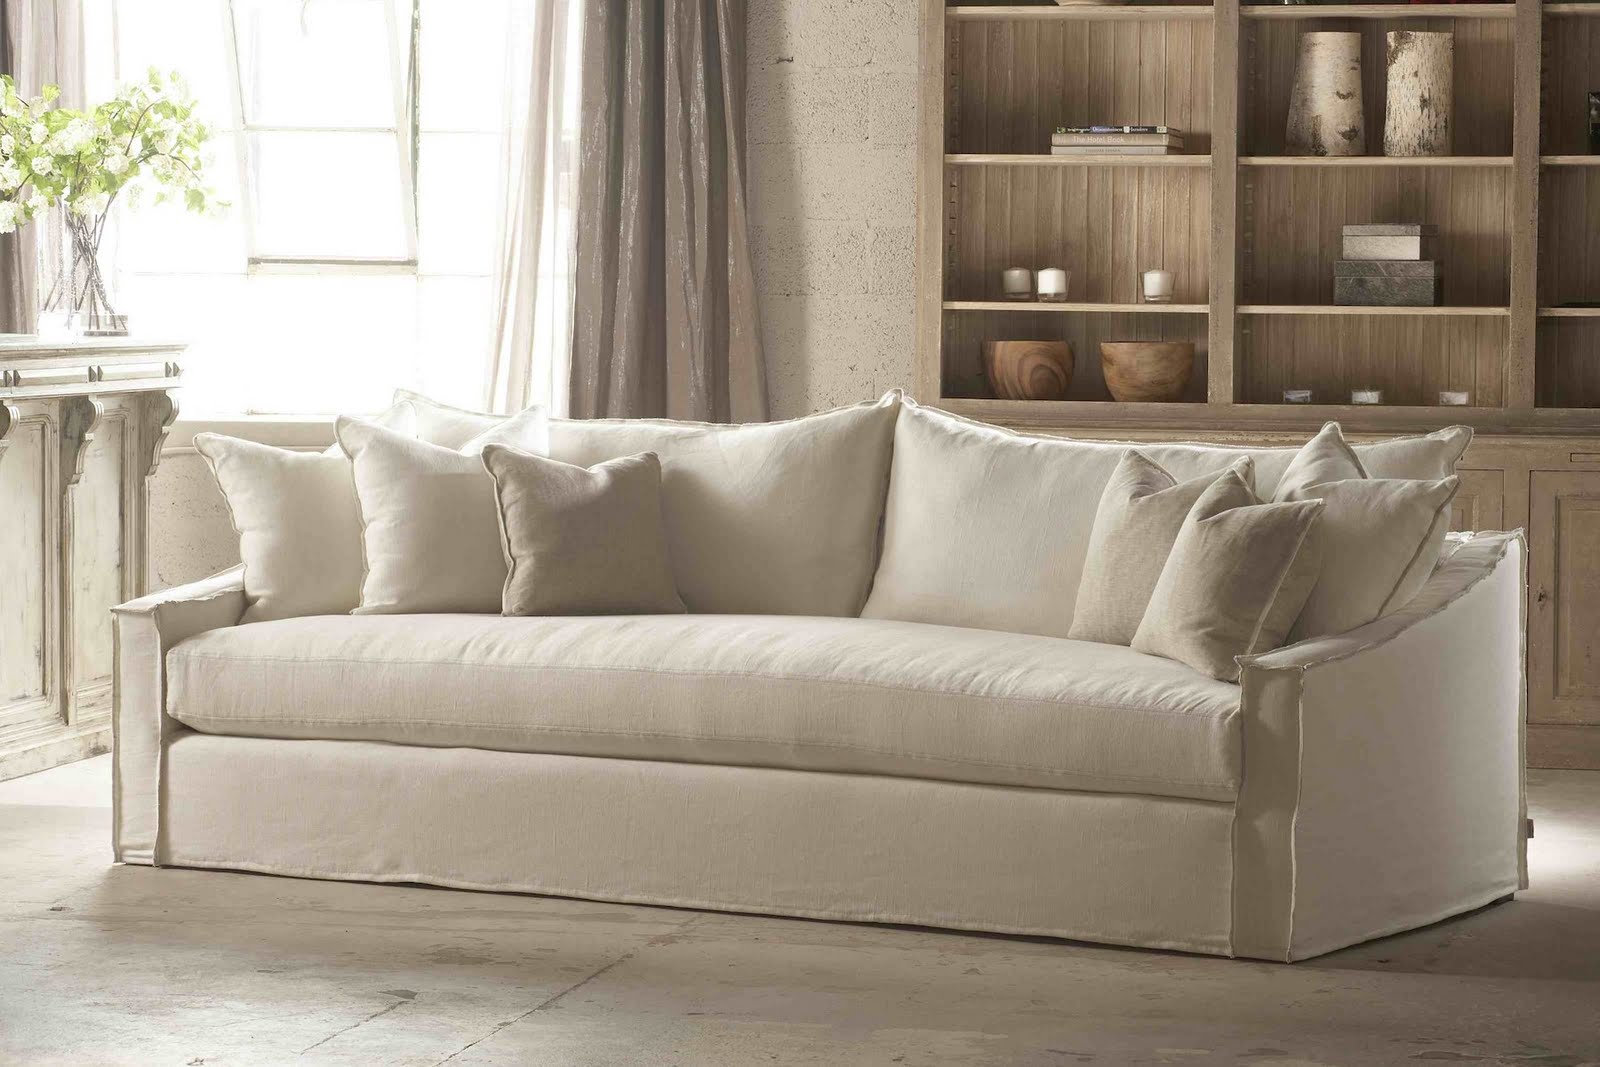 Verellen Furniture Decoration Access